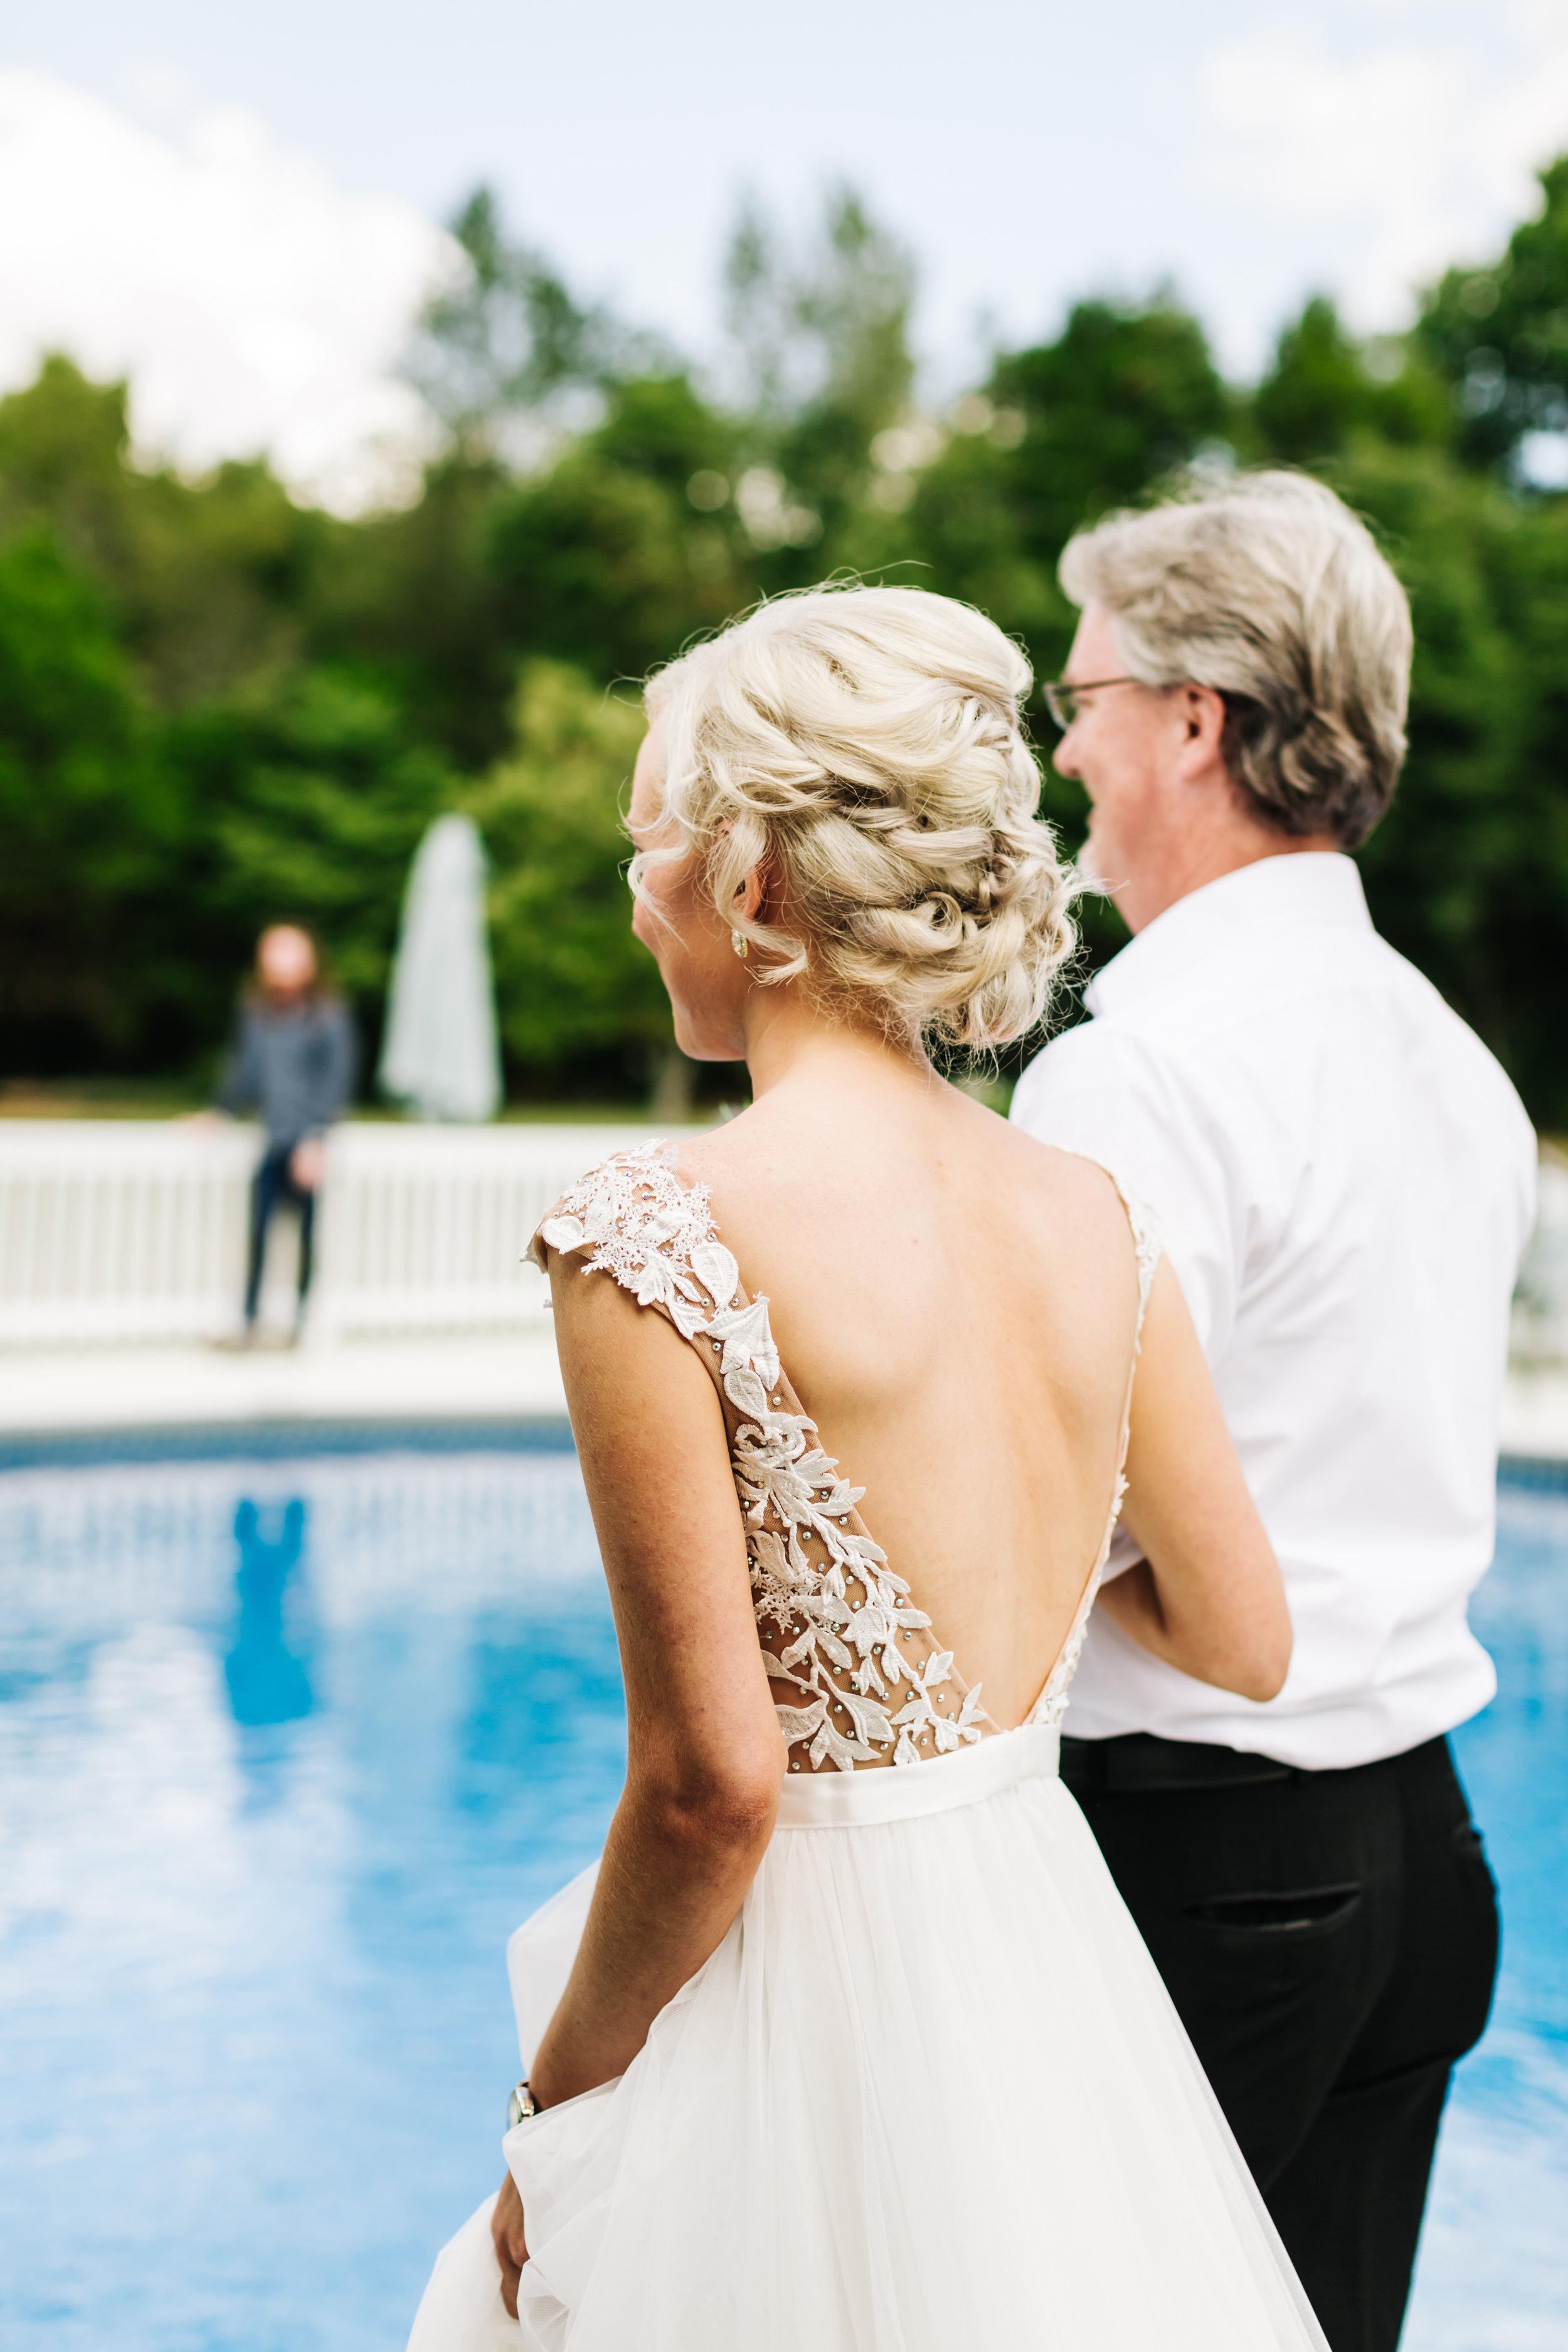 2018.09.02 Ray and Sarah Prizner Nashville TN Wedding FINALS-235.jpg